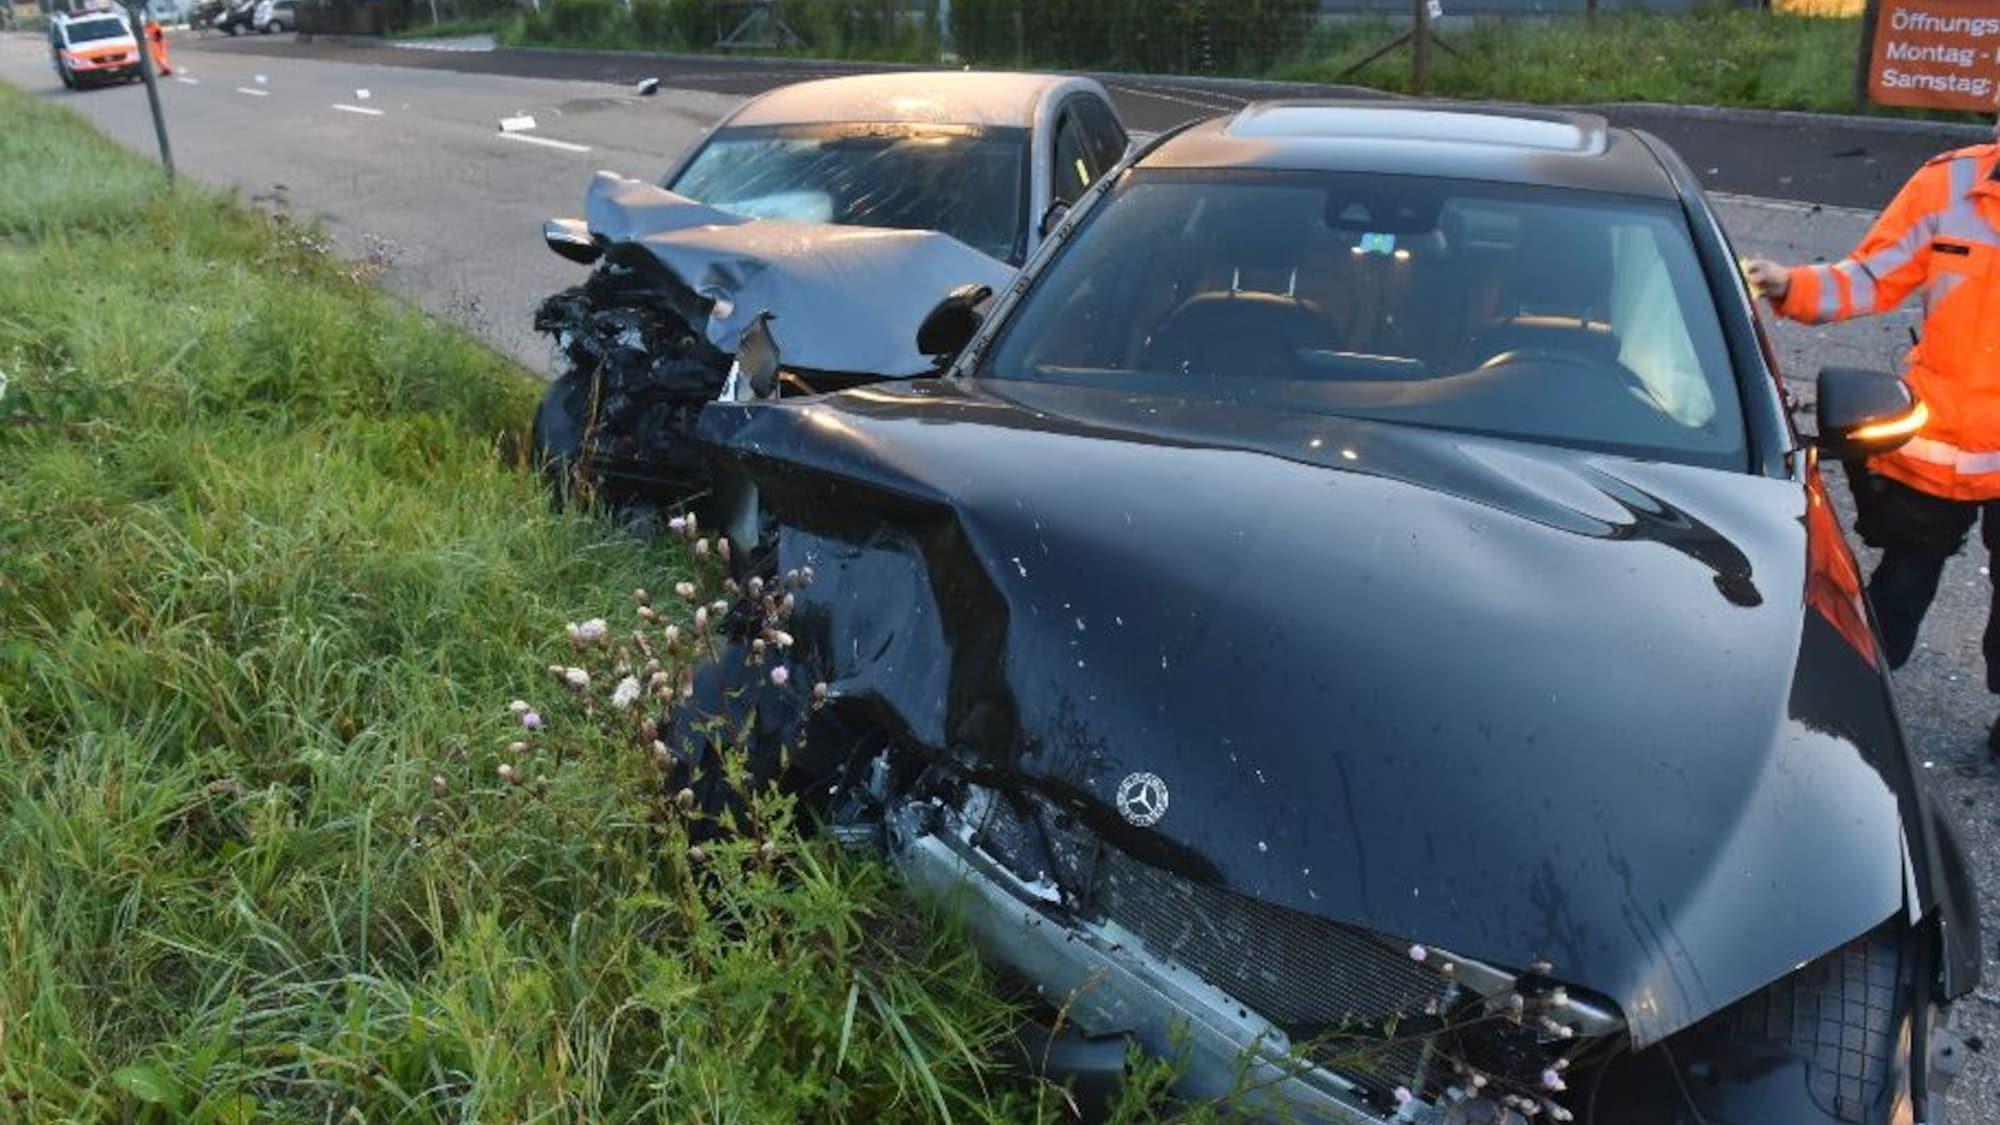 Verletzte bei Frontal-Crash in Kollbrunn ZH: 19-Jähriger fährt Mercedes zu Schrott